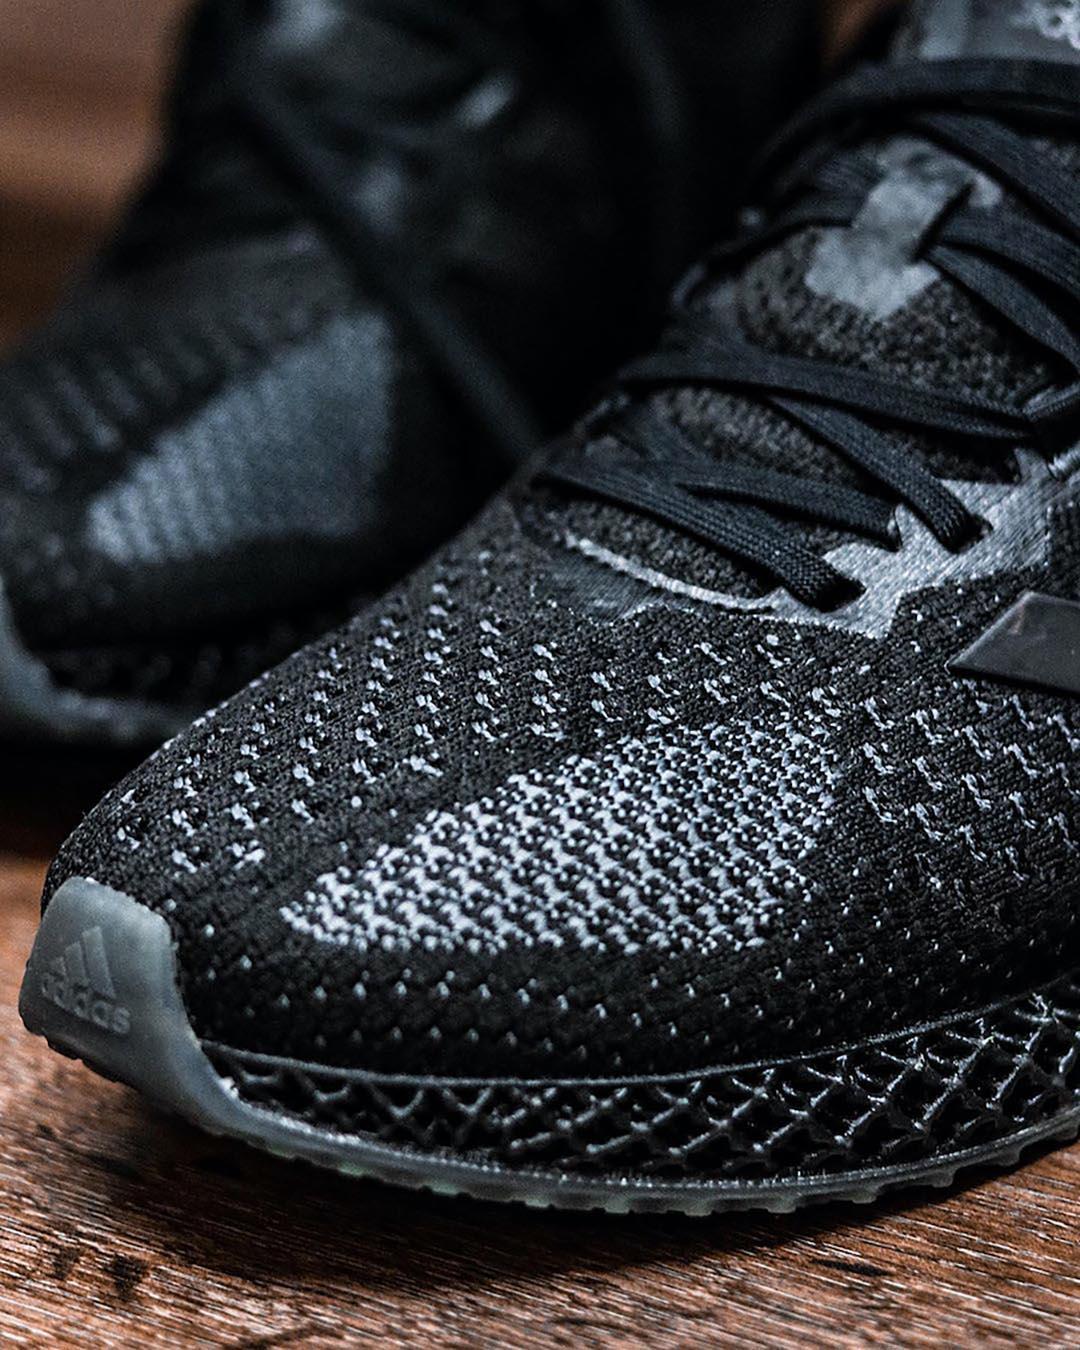 adidas-4D-Run-1-Triple-Black-Release-Date-03